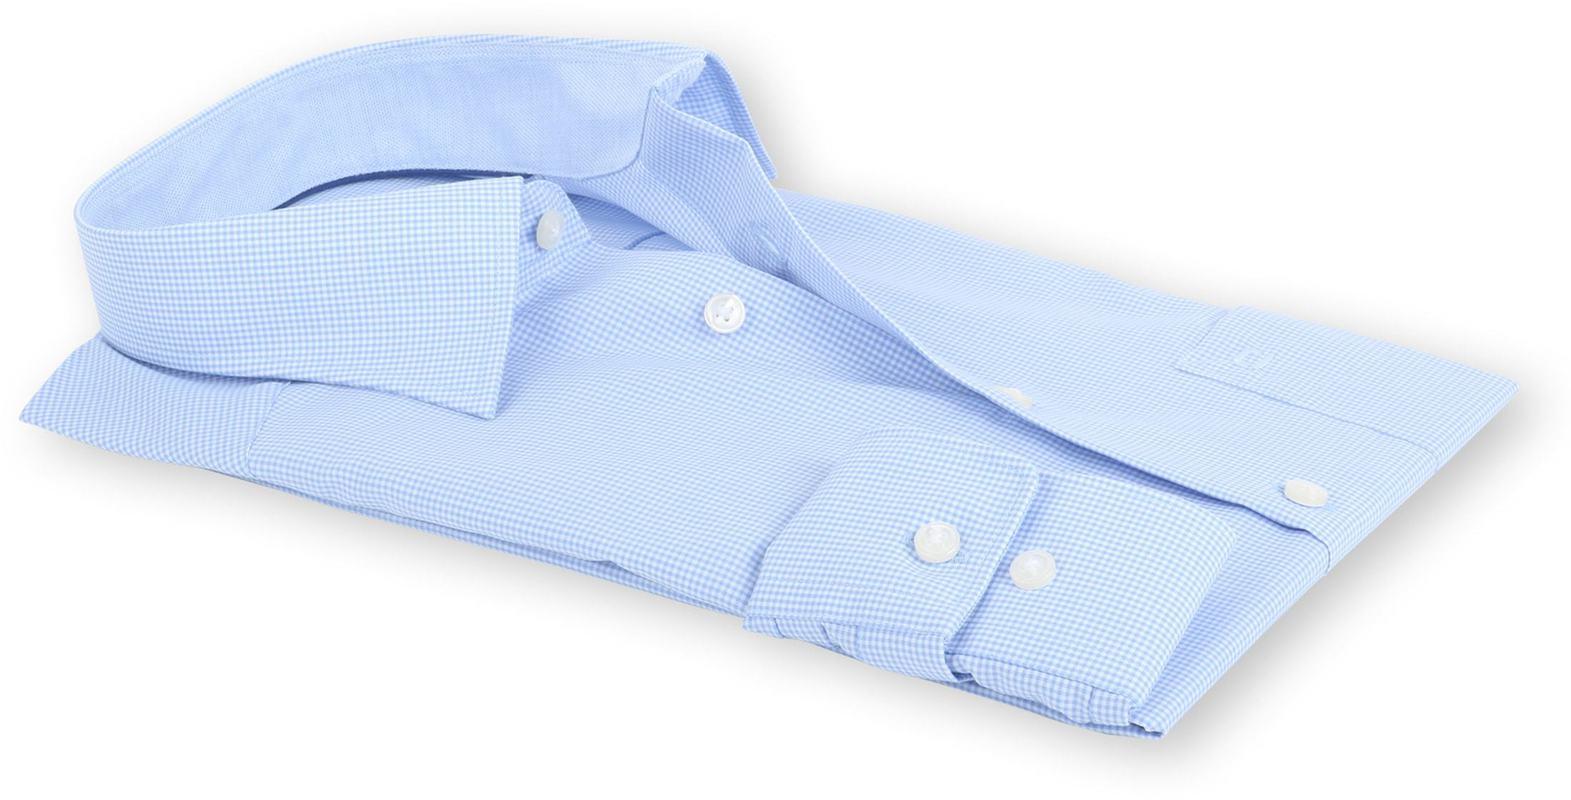 OLYMP Luxor Comfort Fit Shirt Blauw Ruit - Blauw maat 45